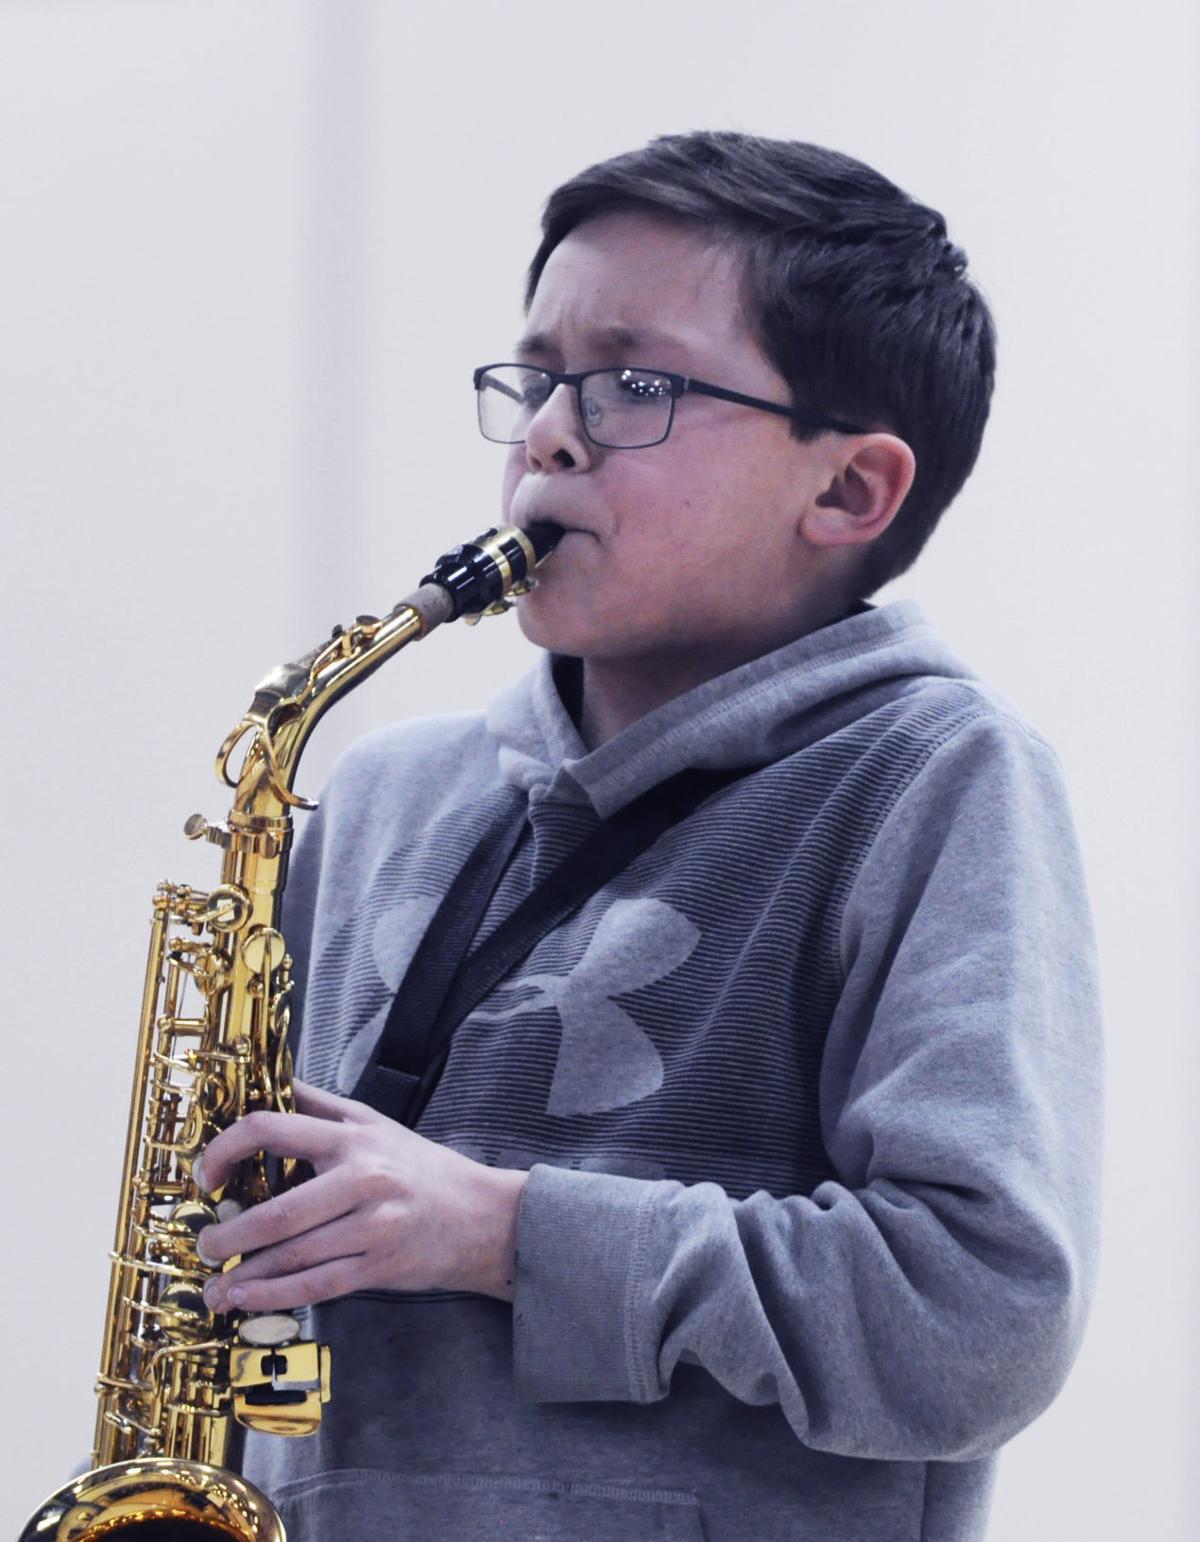 Jacob Olson sax player Brookwood Middle School